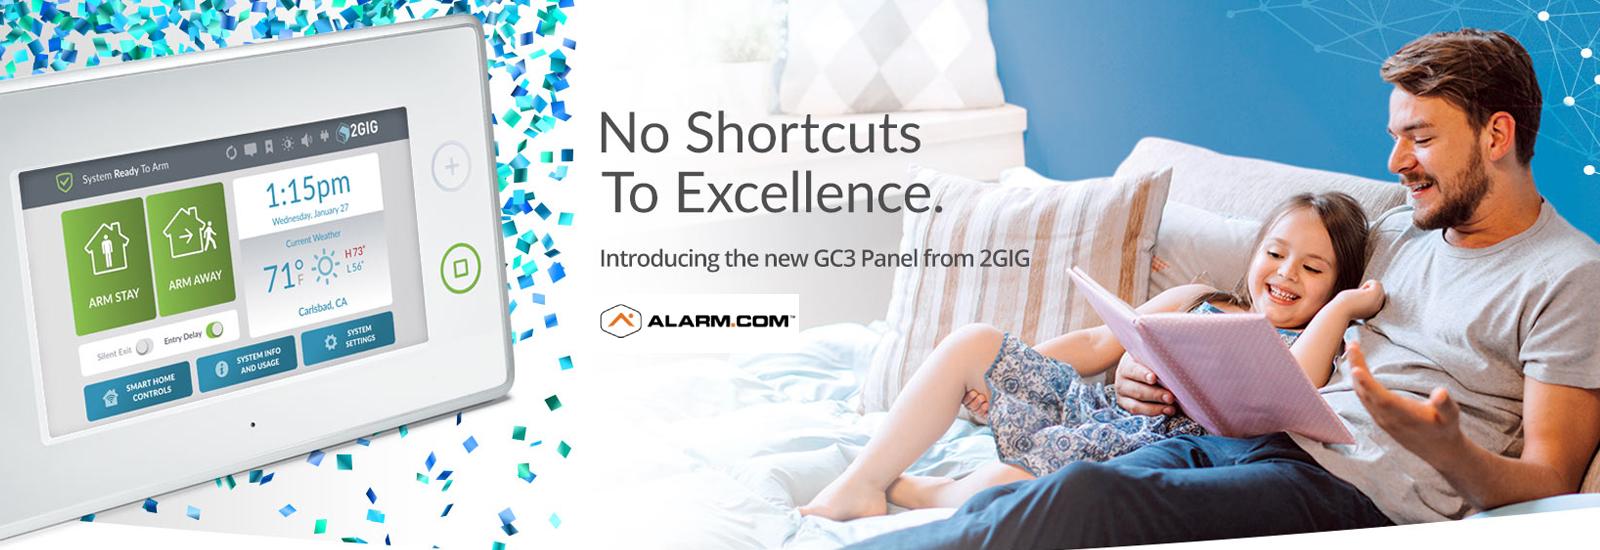 2GIG-alarm-service-miami